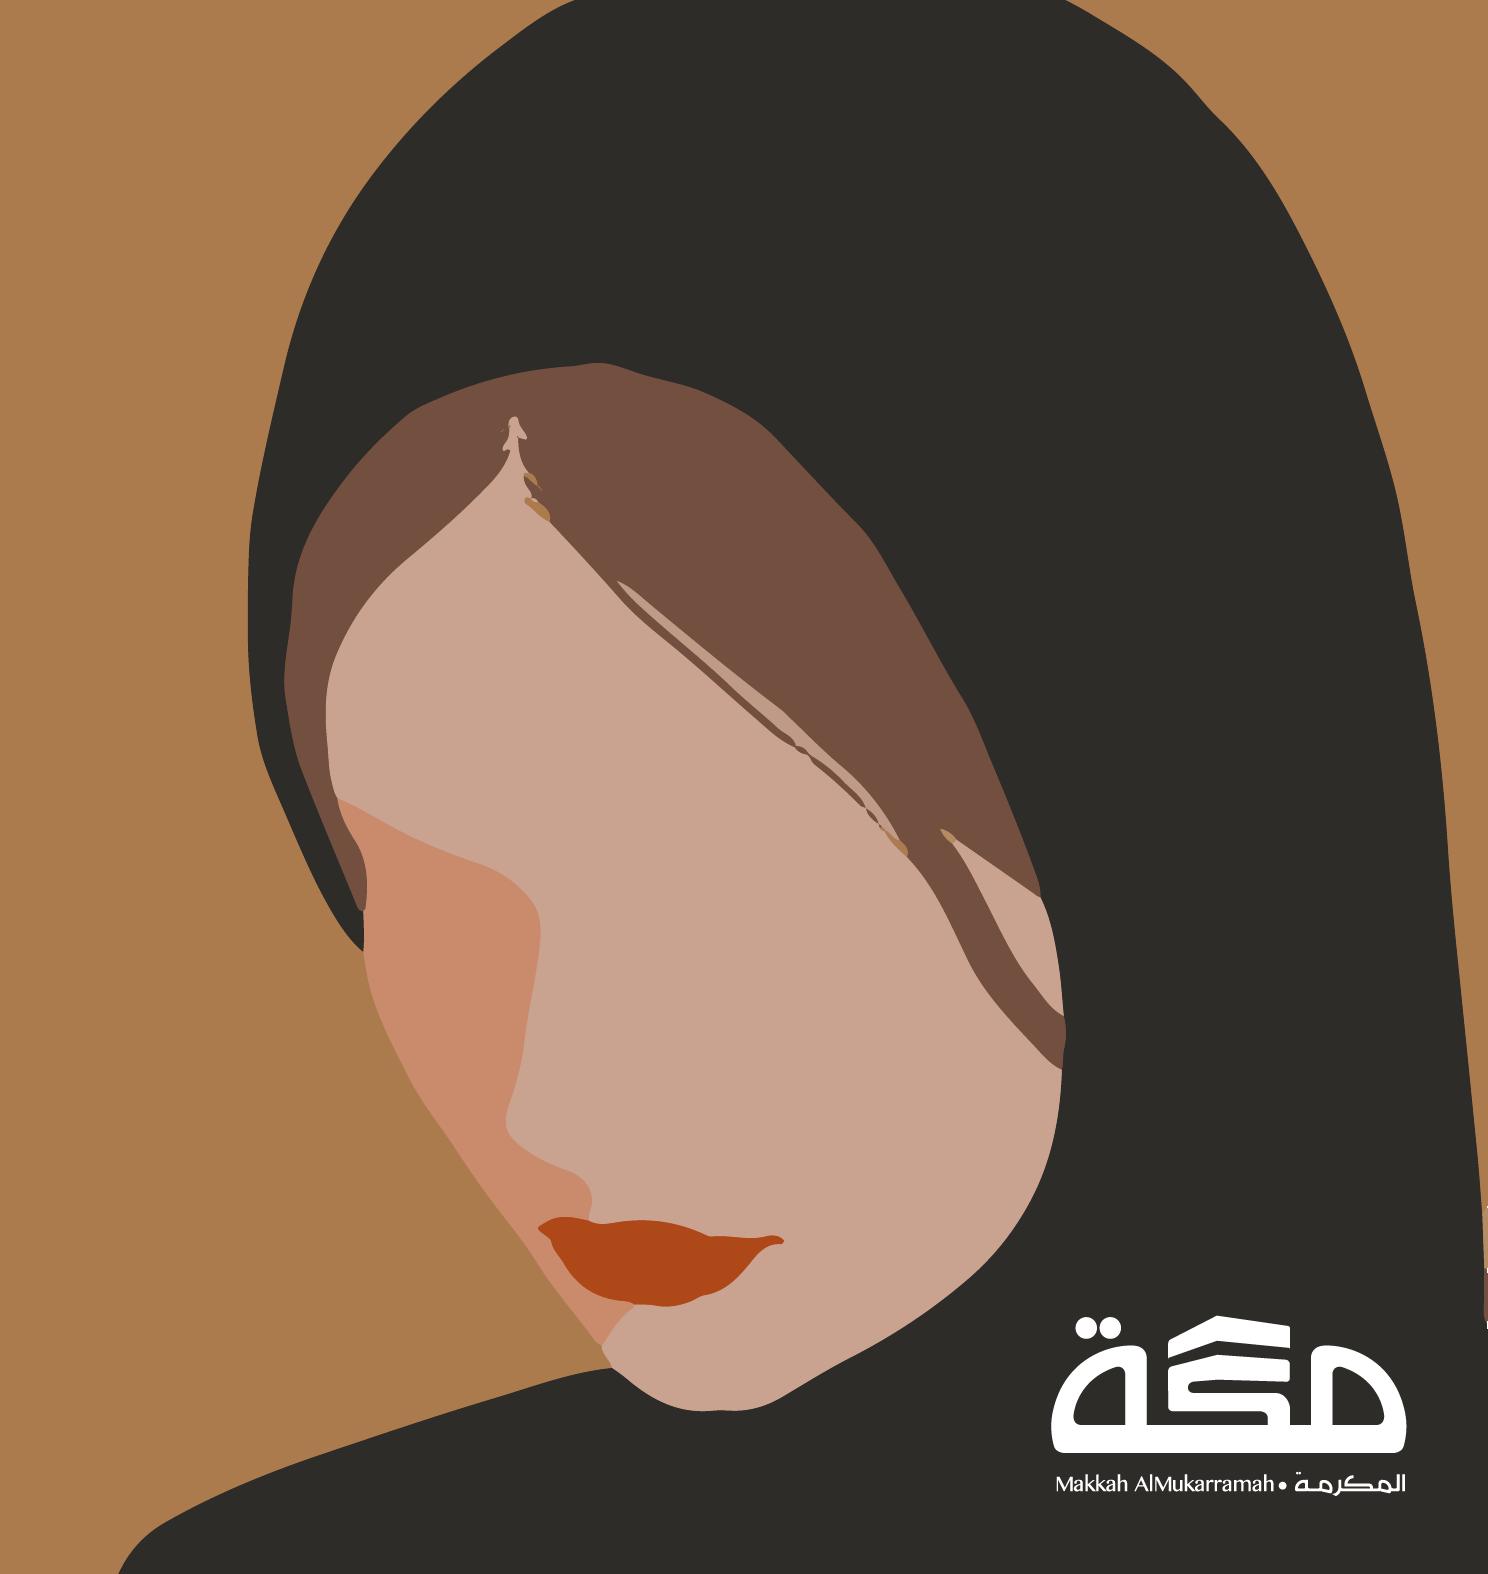 روان آل عبد المتعالي